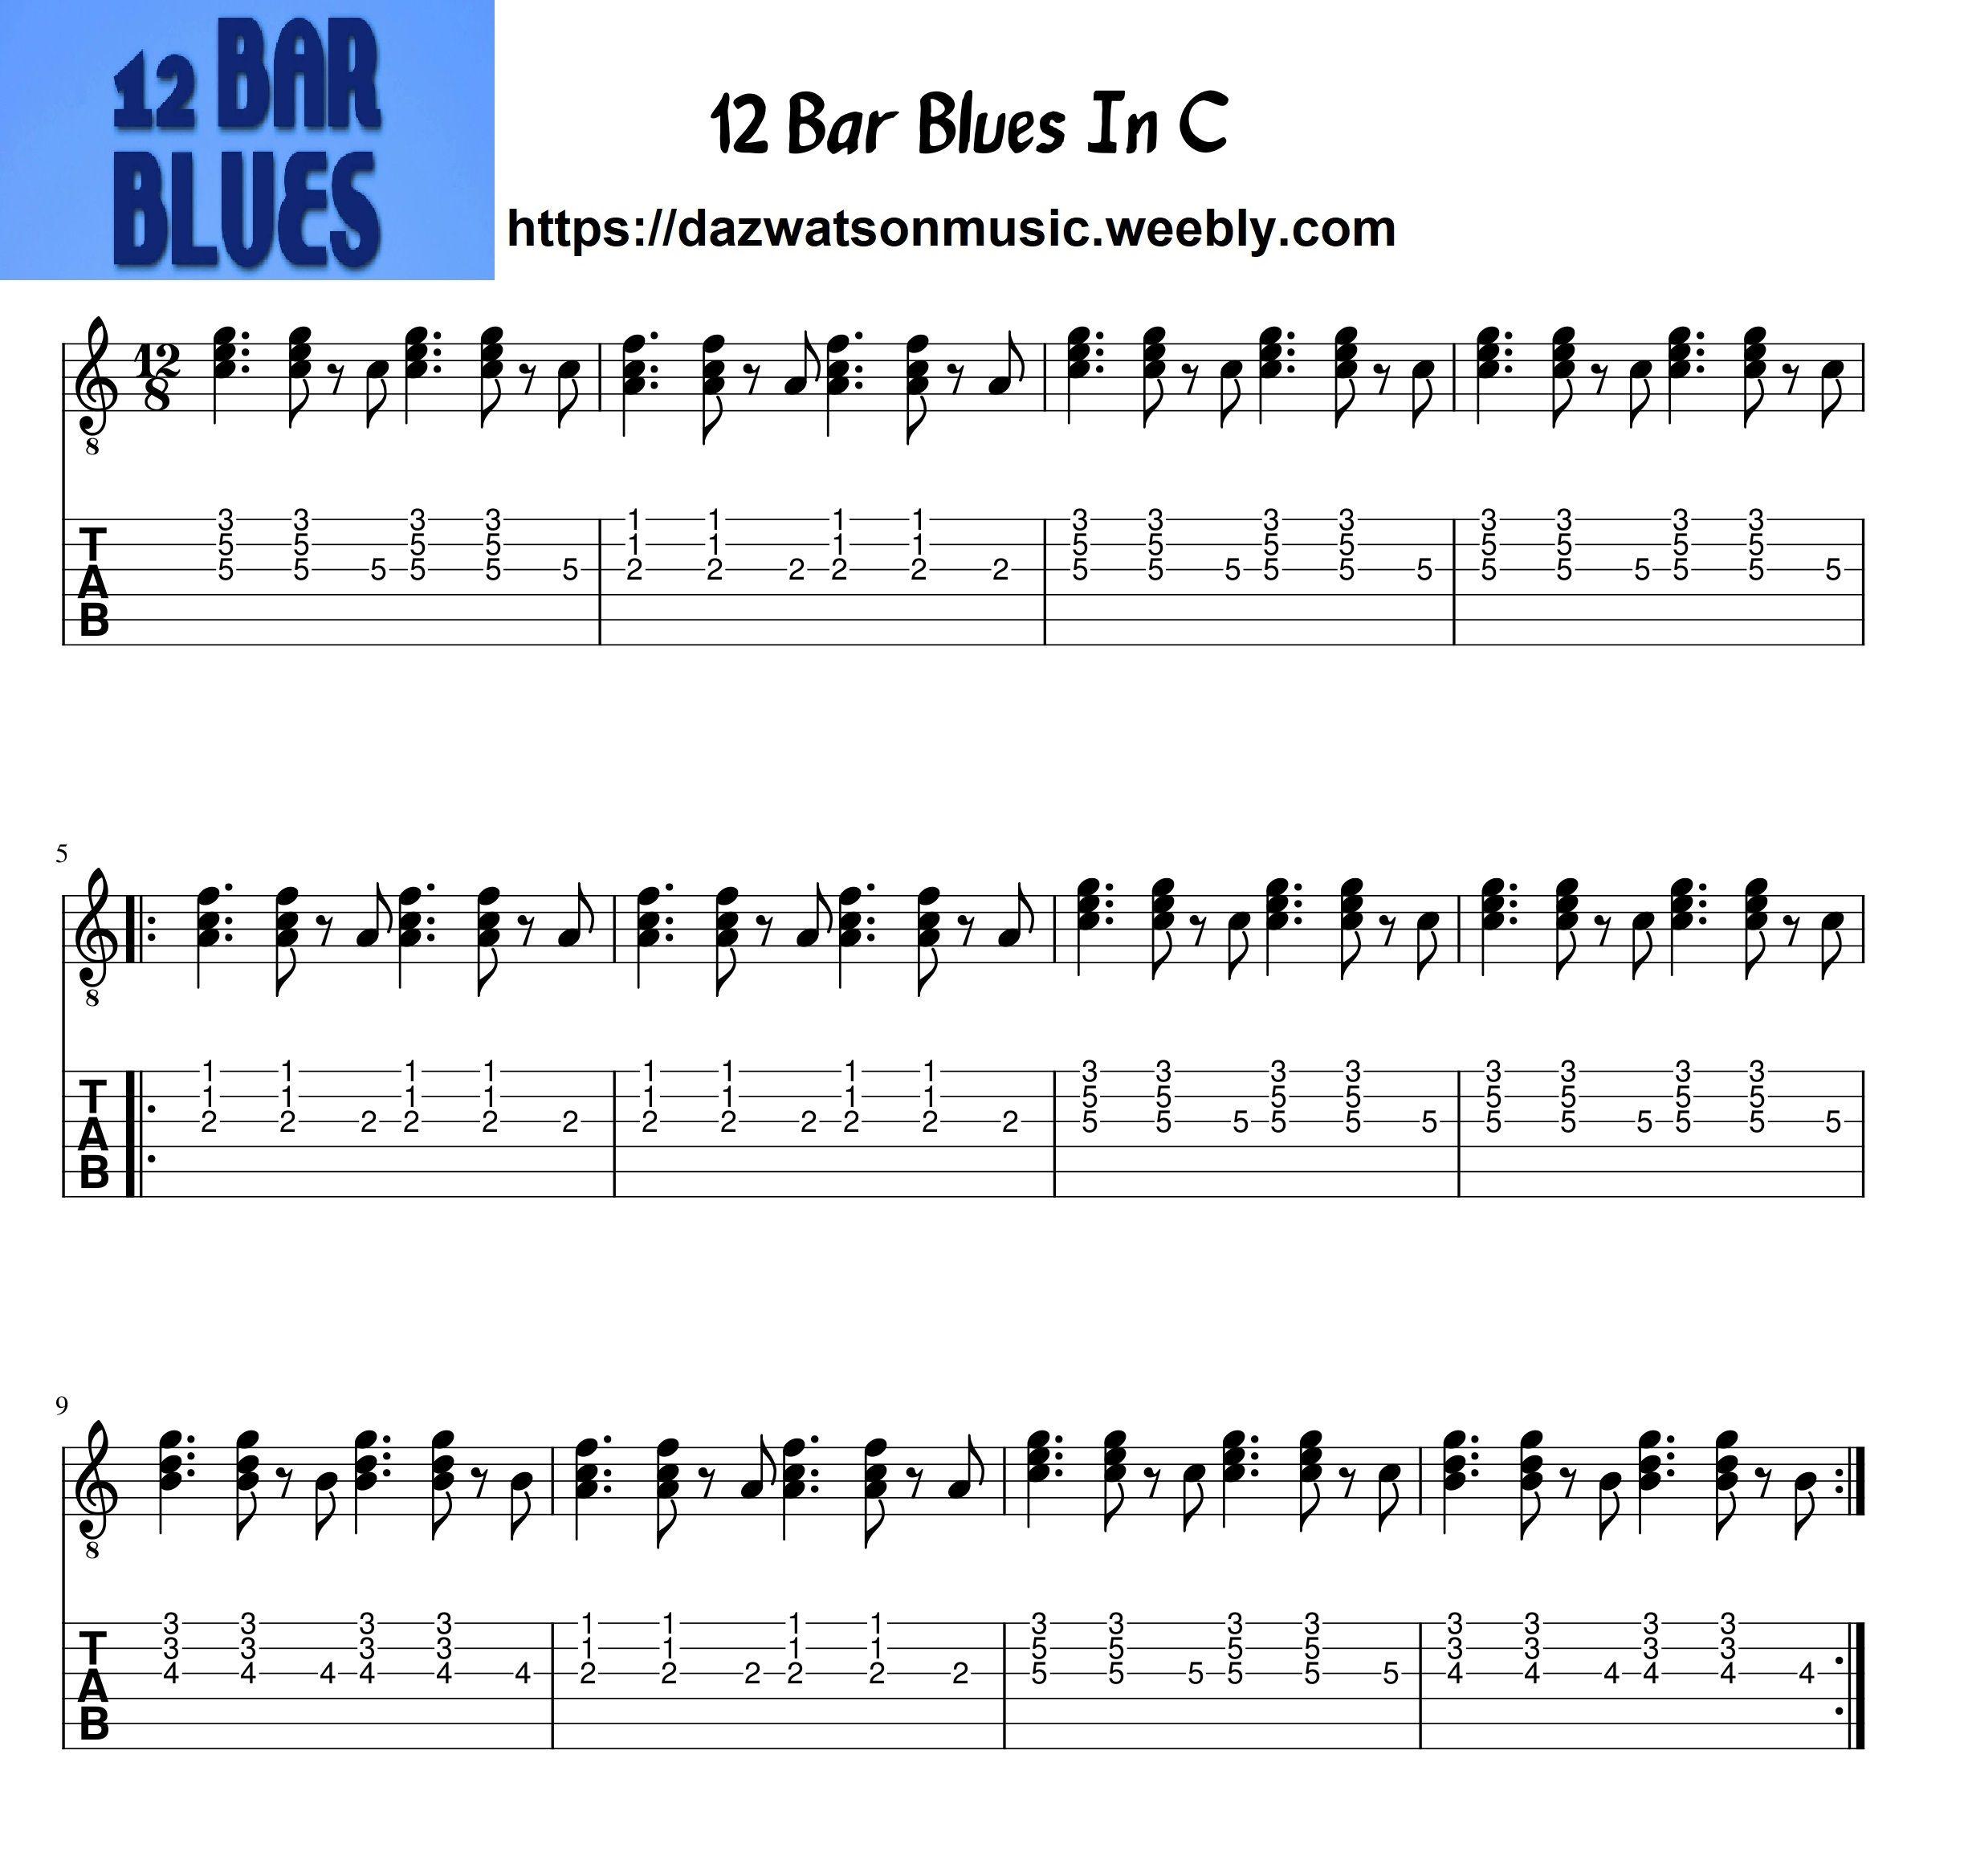 12 Bar Blues For Guitar Guitar Tabs Blues Guitar Guitar Tabs Songs